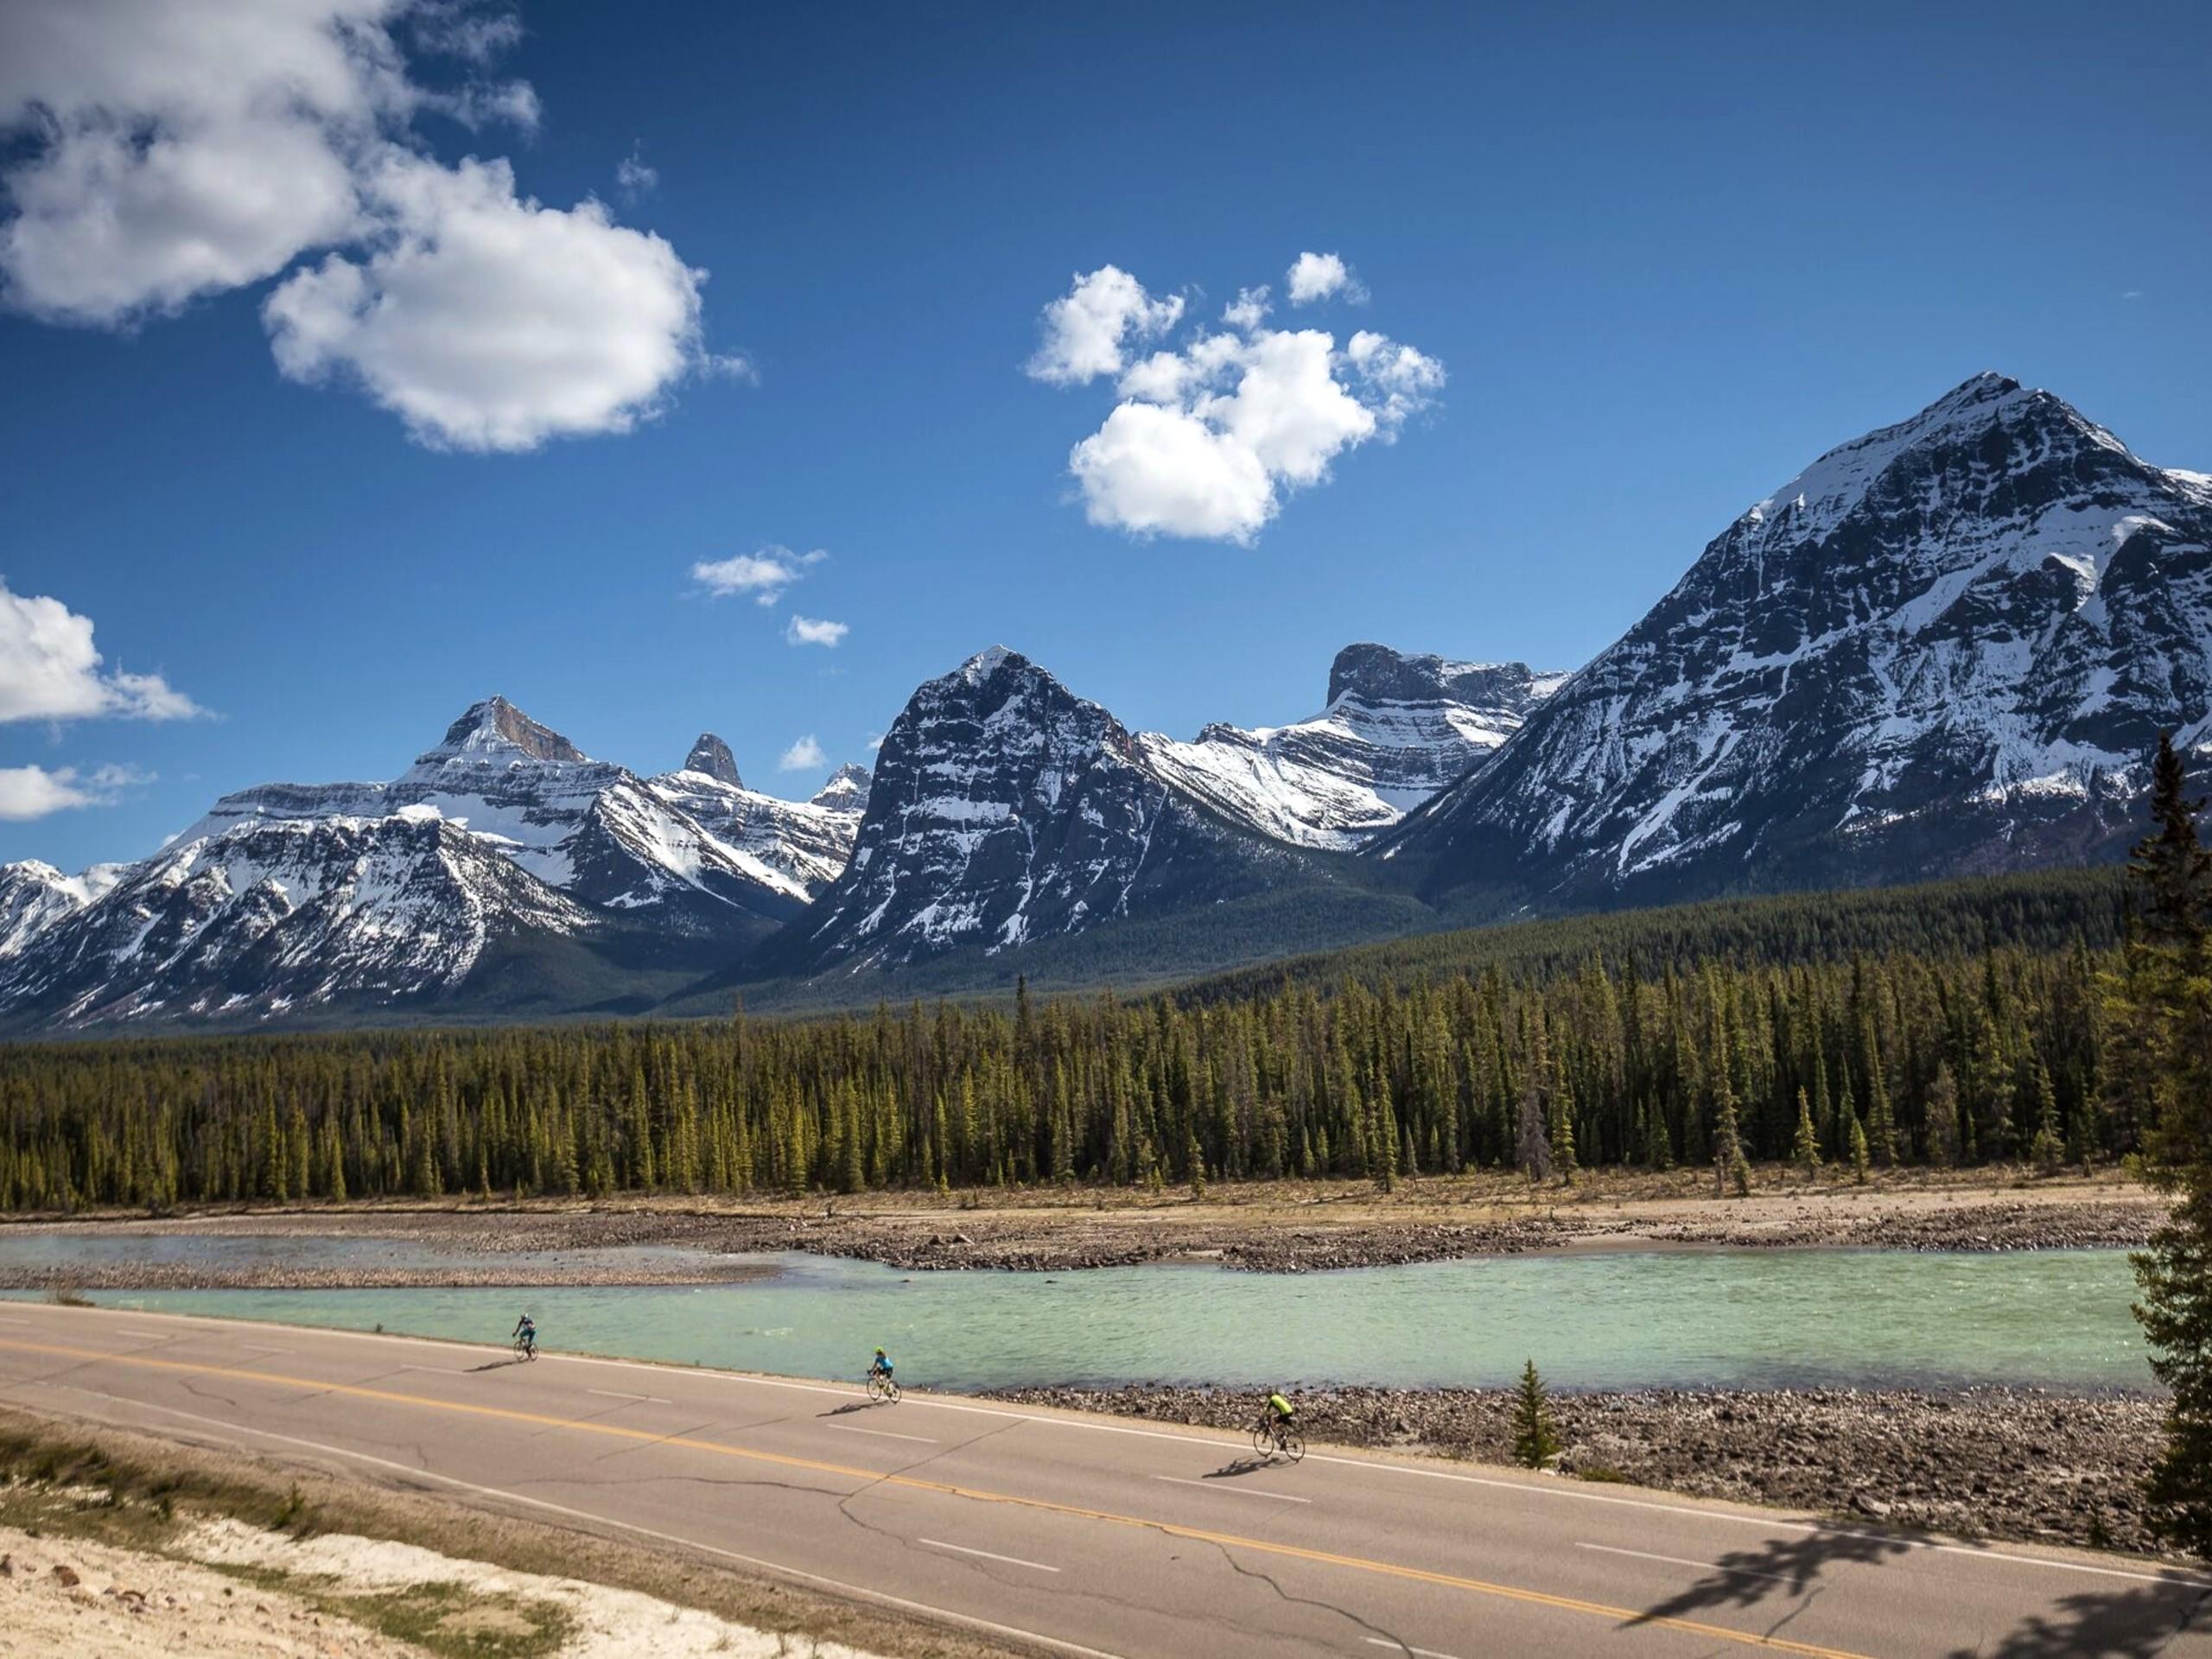 Stunning mountain peaks near the river, seen on a biking tour in Alberta